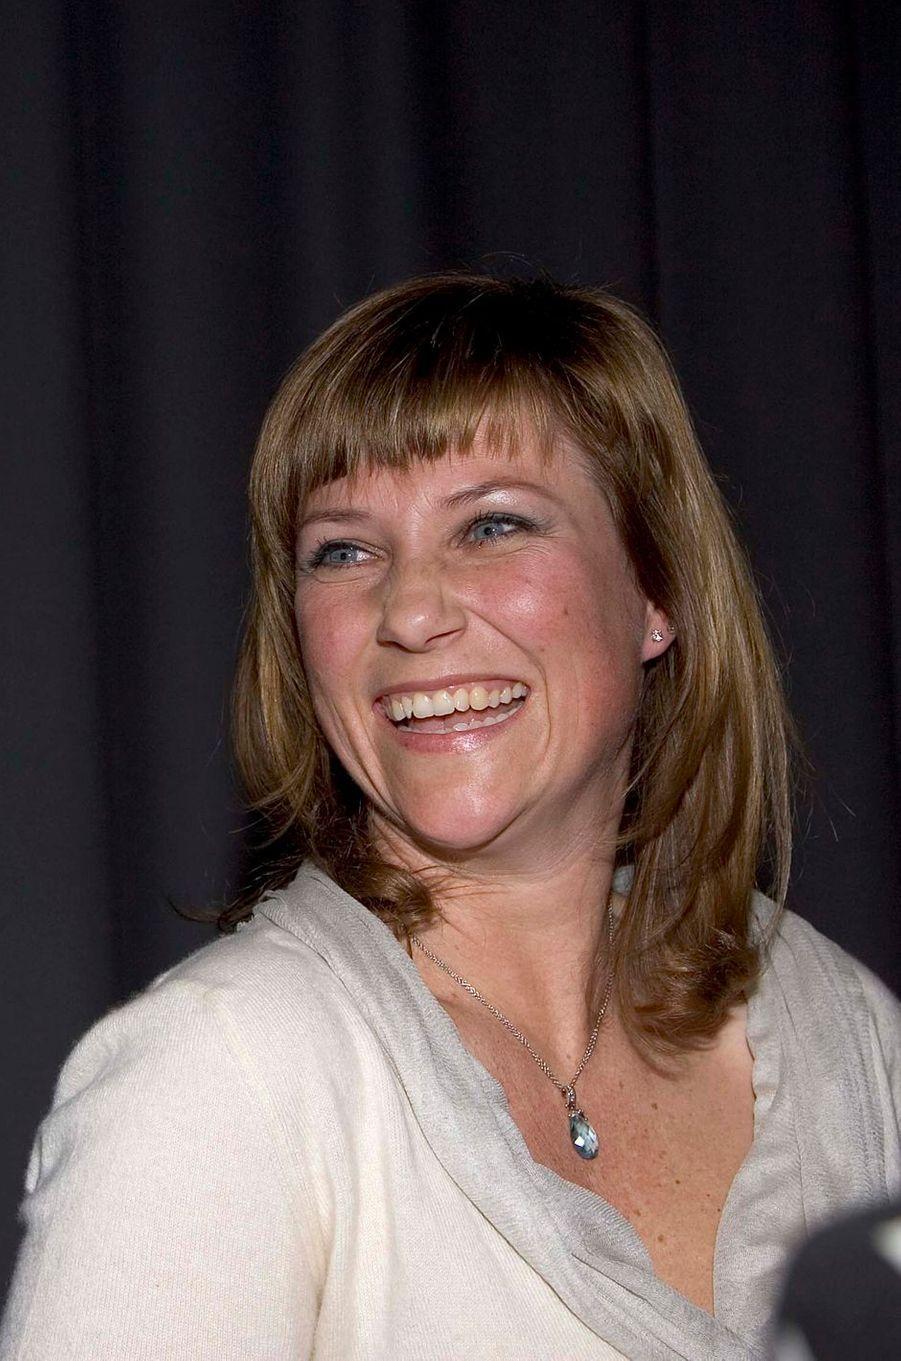 La princesse Märtha Louise de Norvège, le 7 novembre 2009